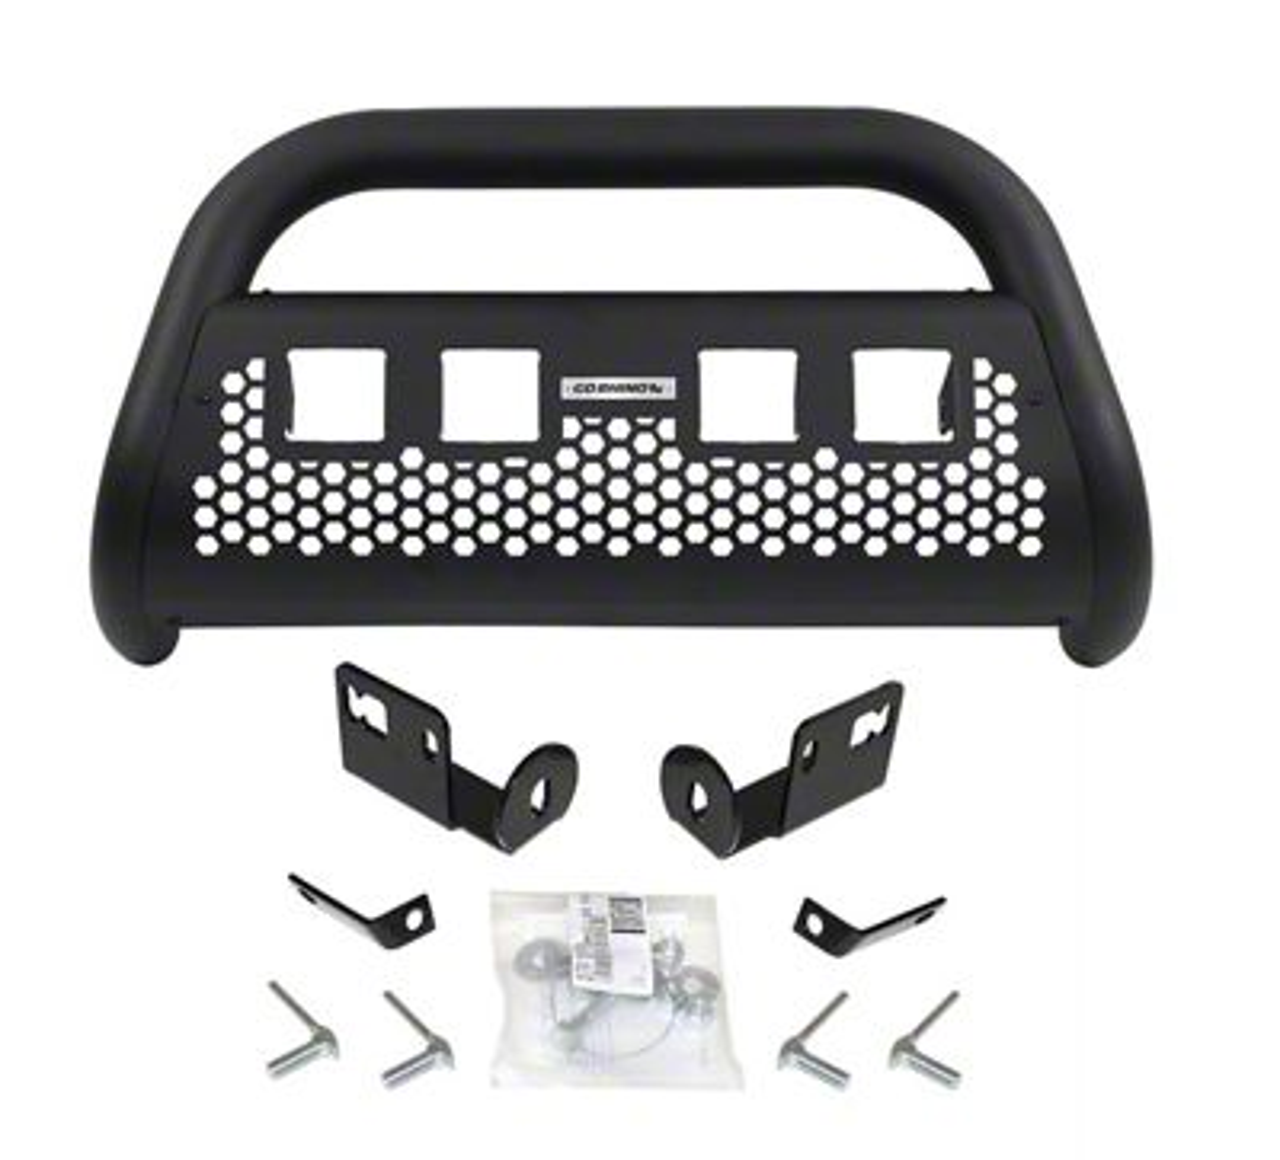 Go Rhino RC2 LR Bull Bar w/ Four LED Cube Light Mounting Brackets - Textured Black (16-19 Tacoma)